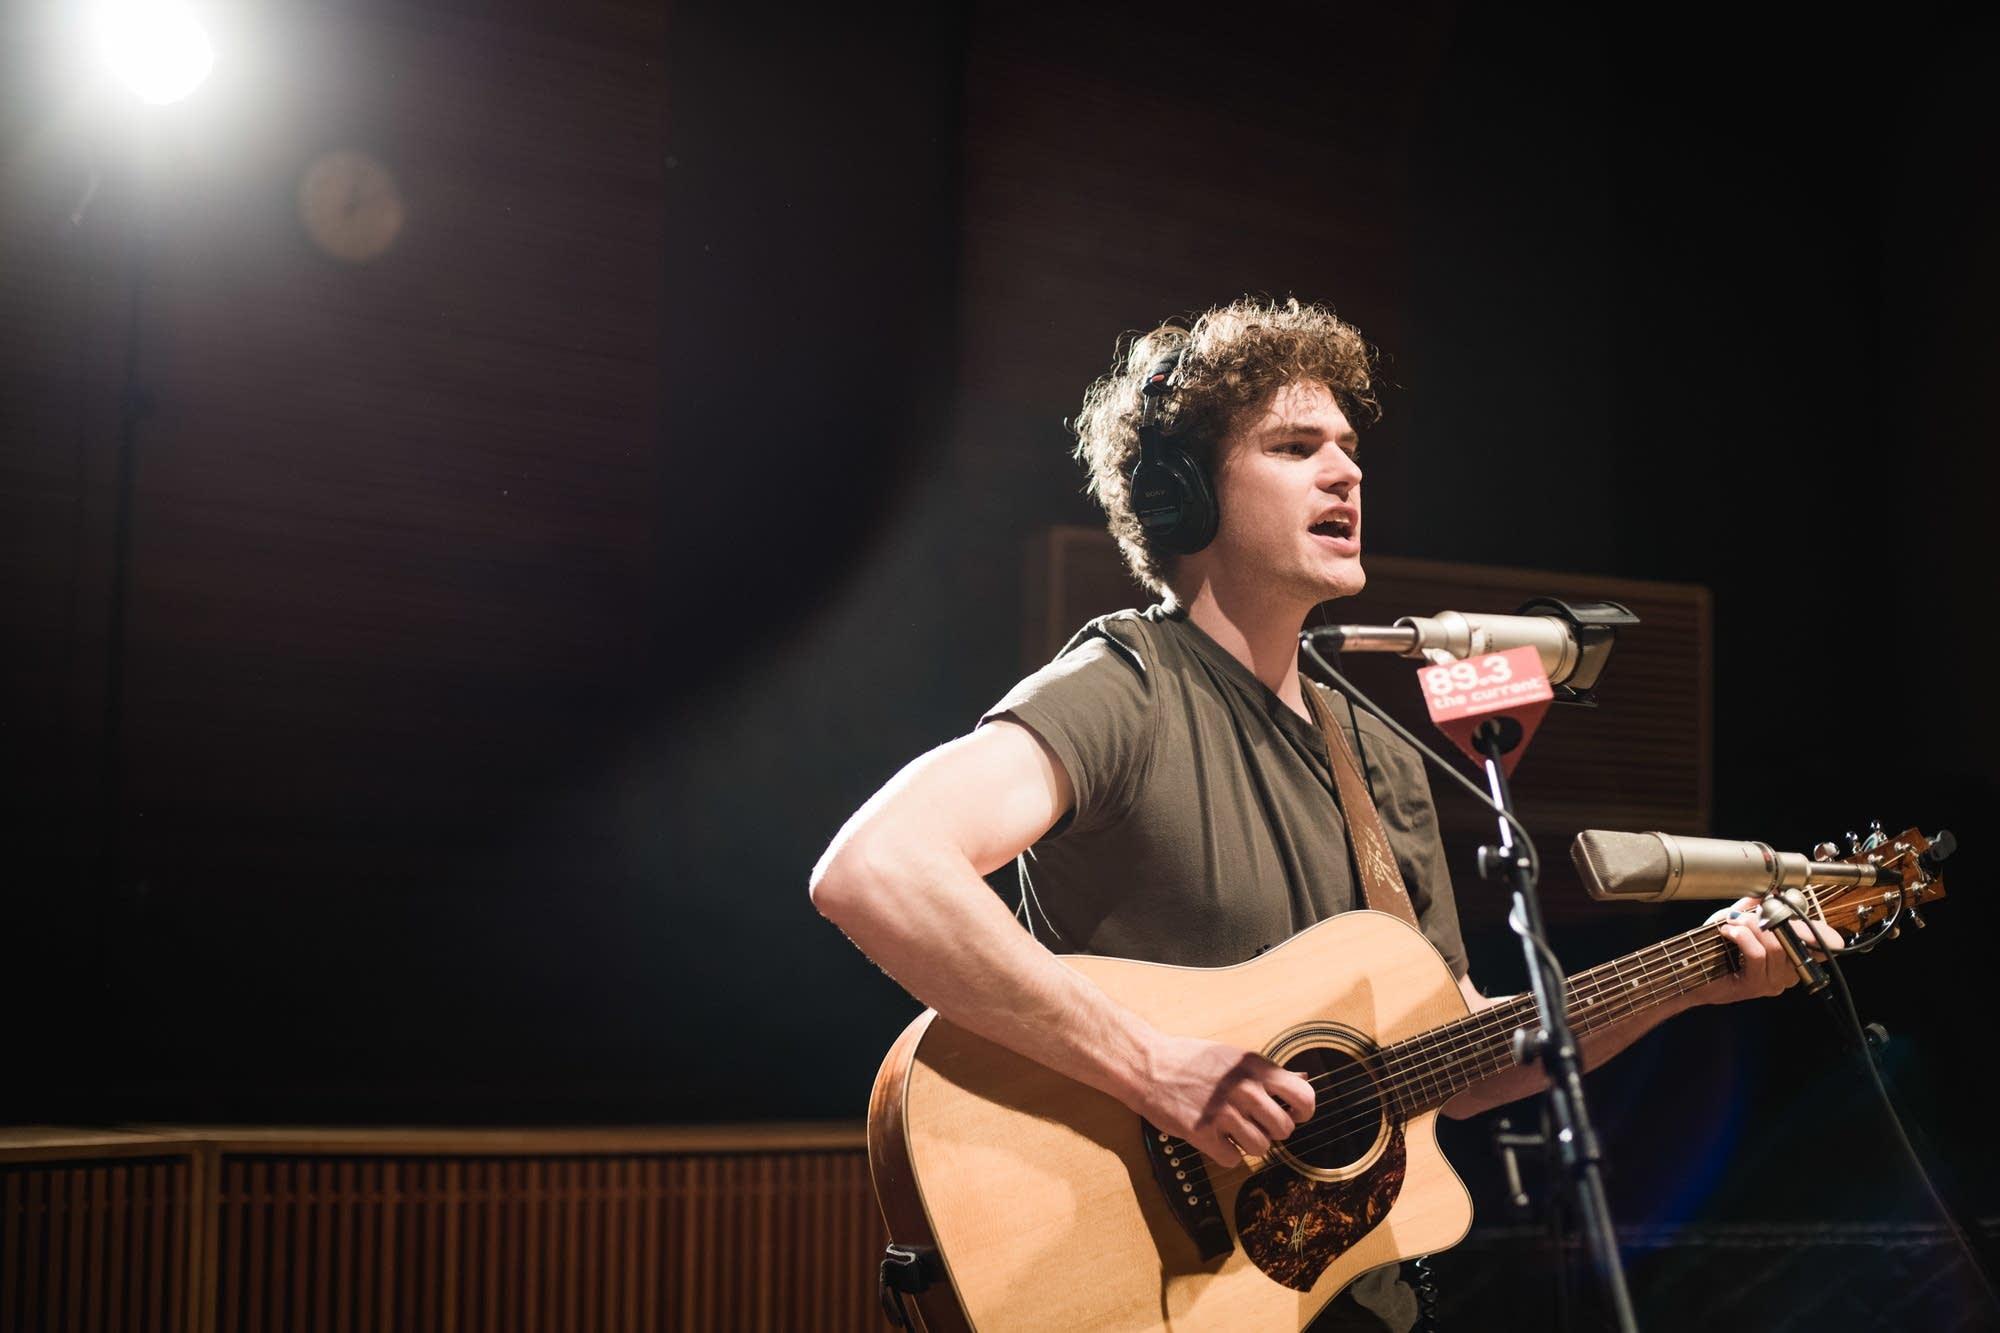 Vance Joy performs in The Current studio